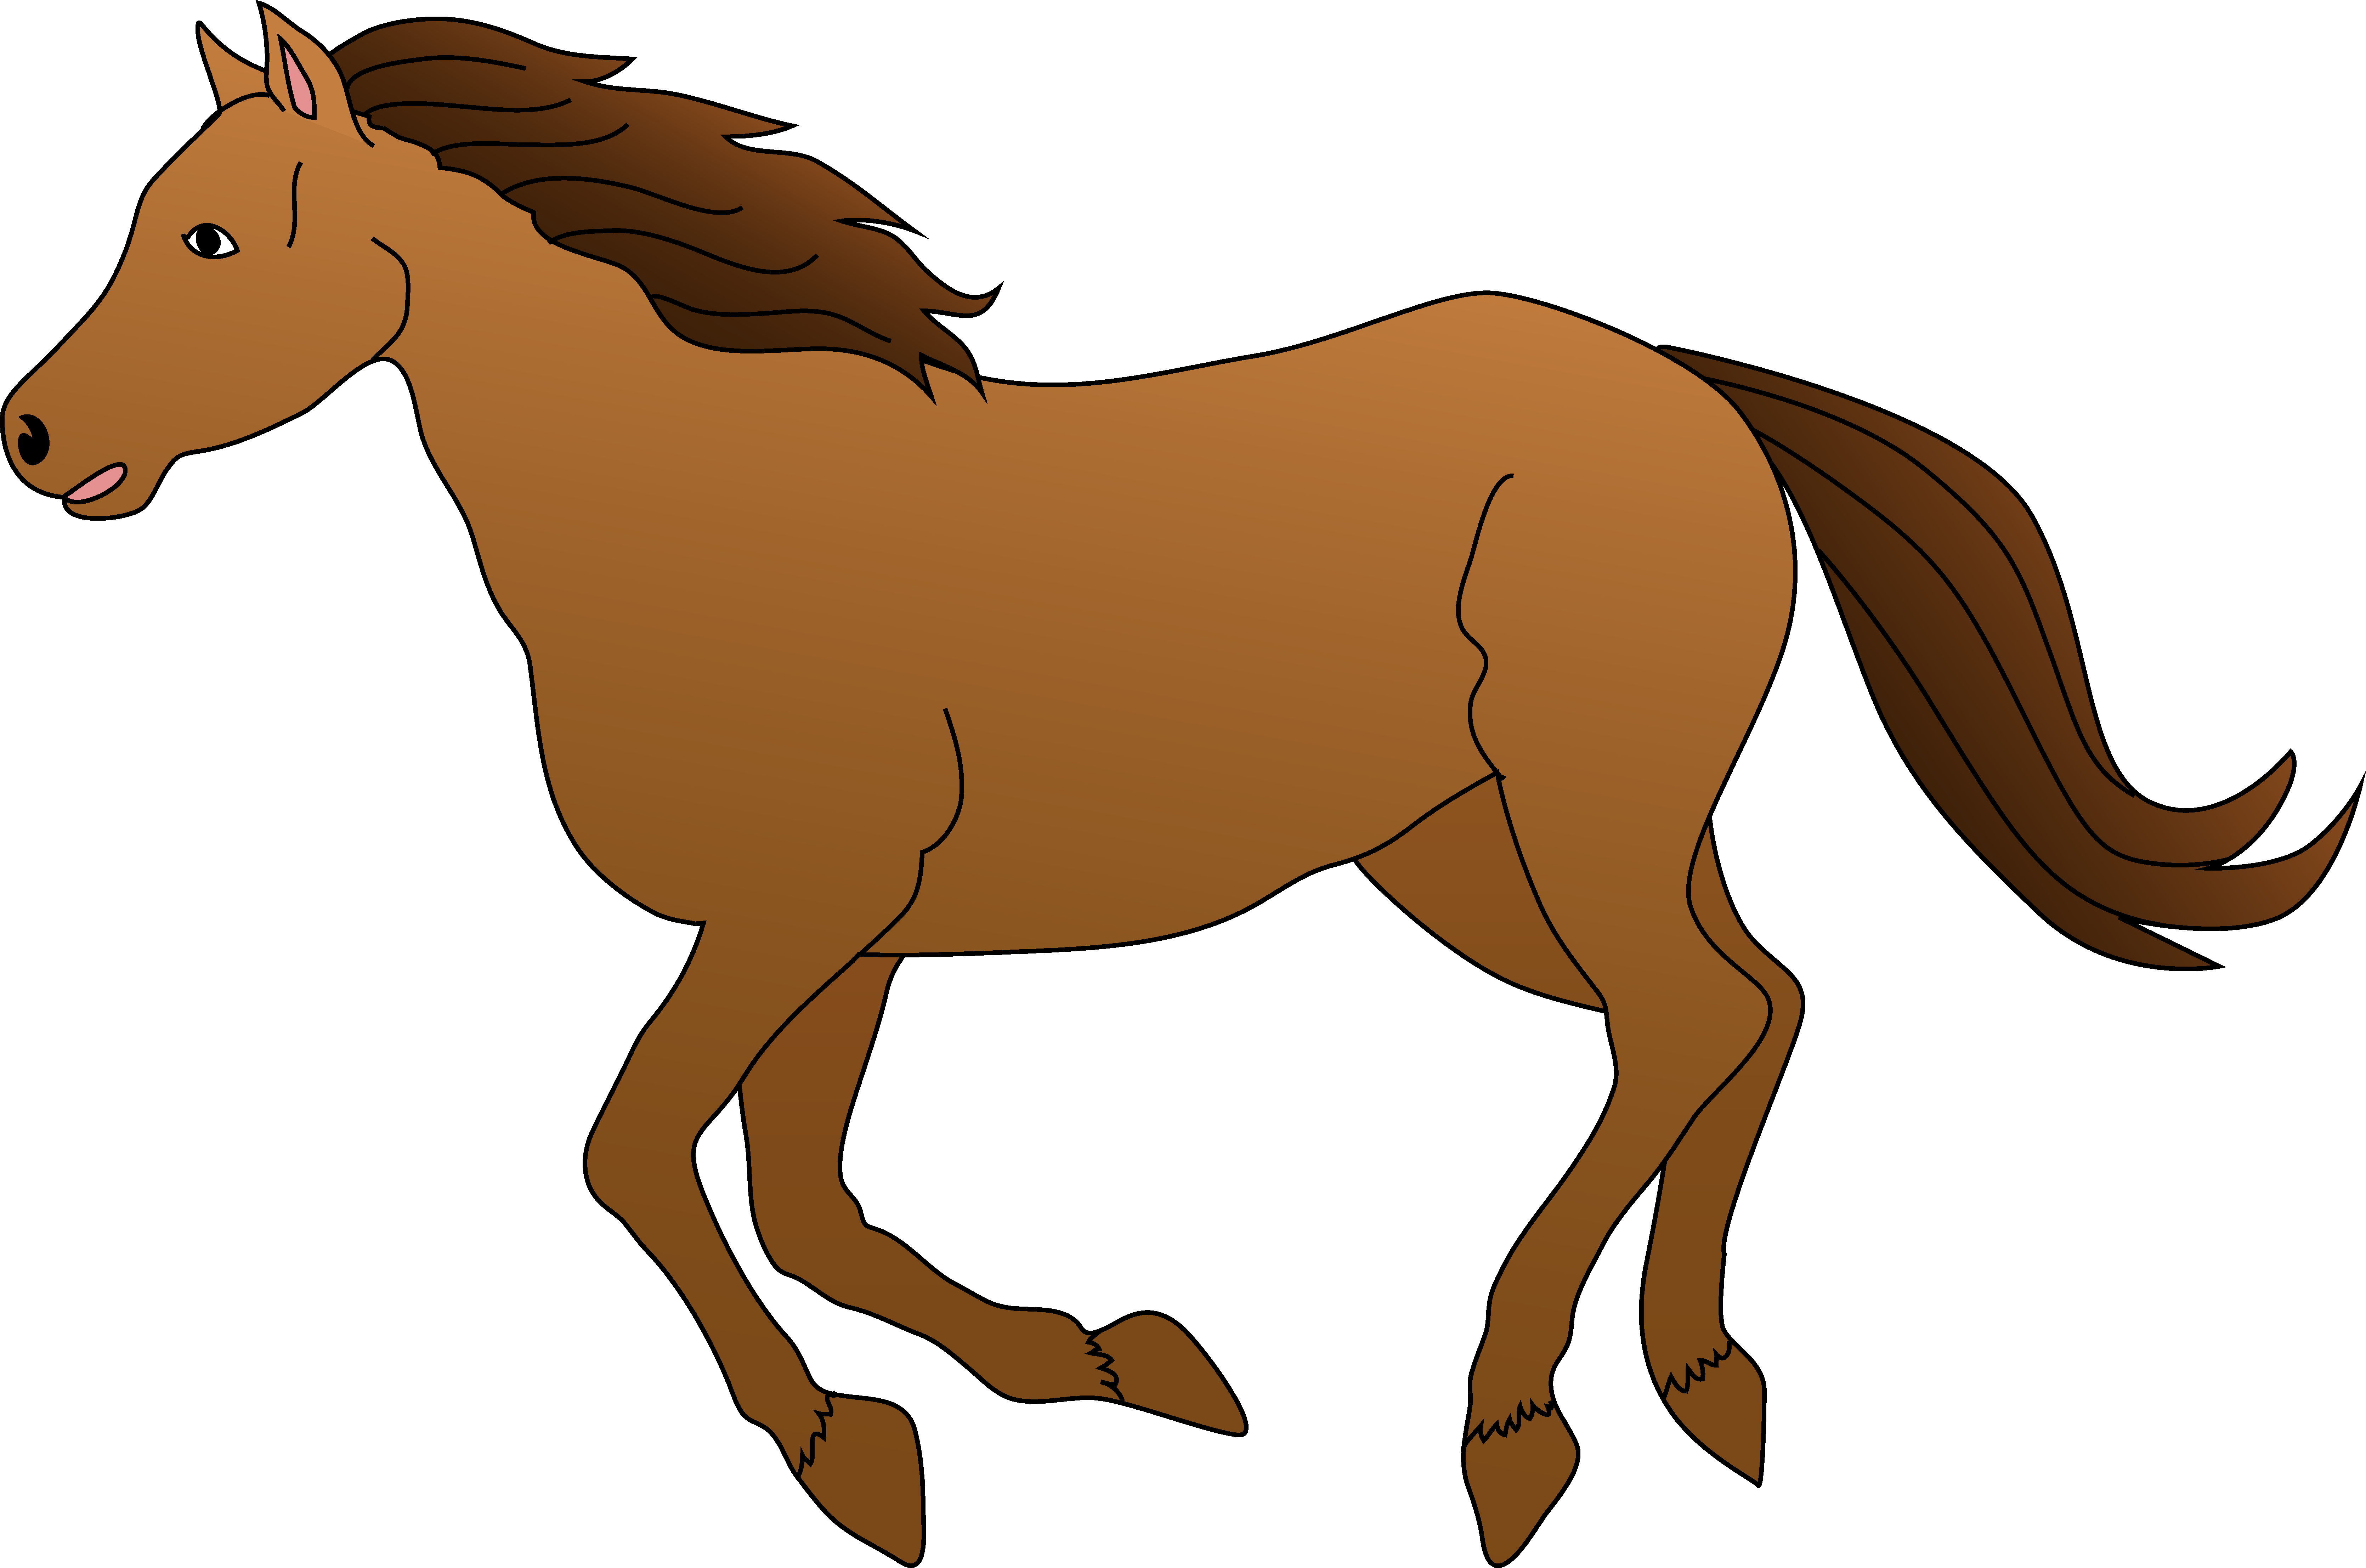 6680x4427 Horse Clipart Free Download Clip Art